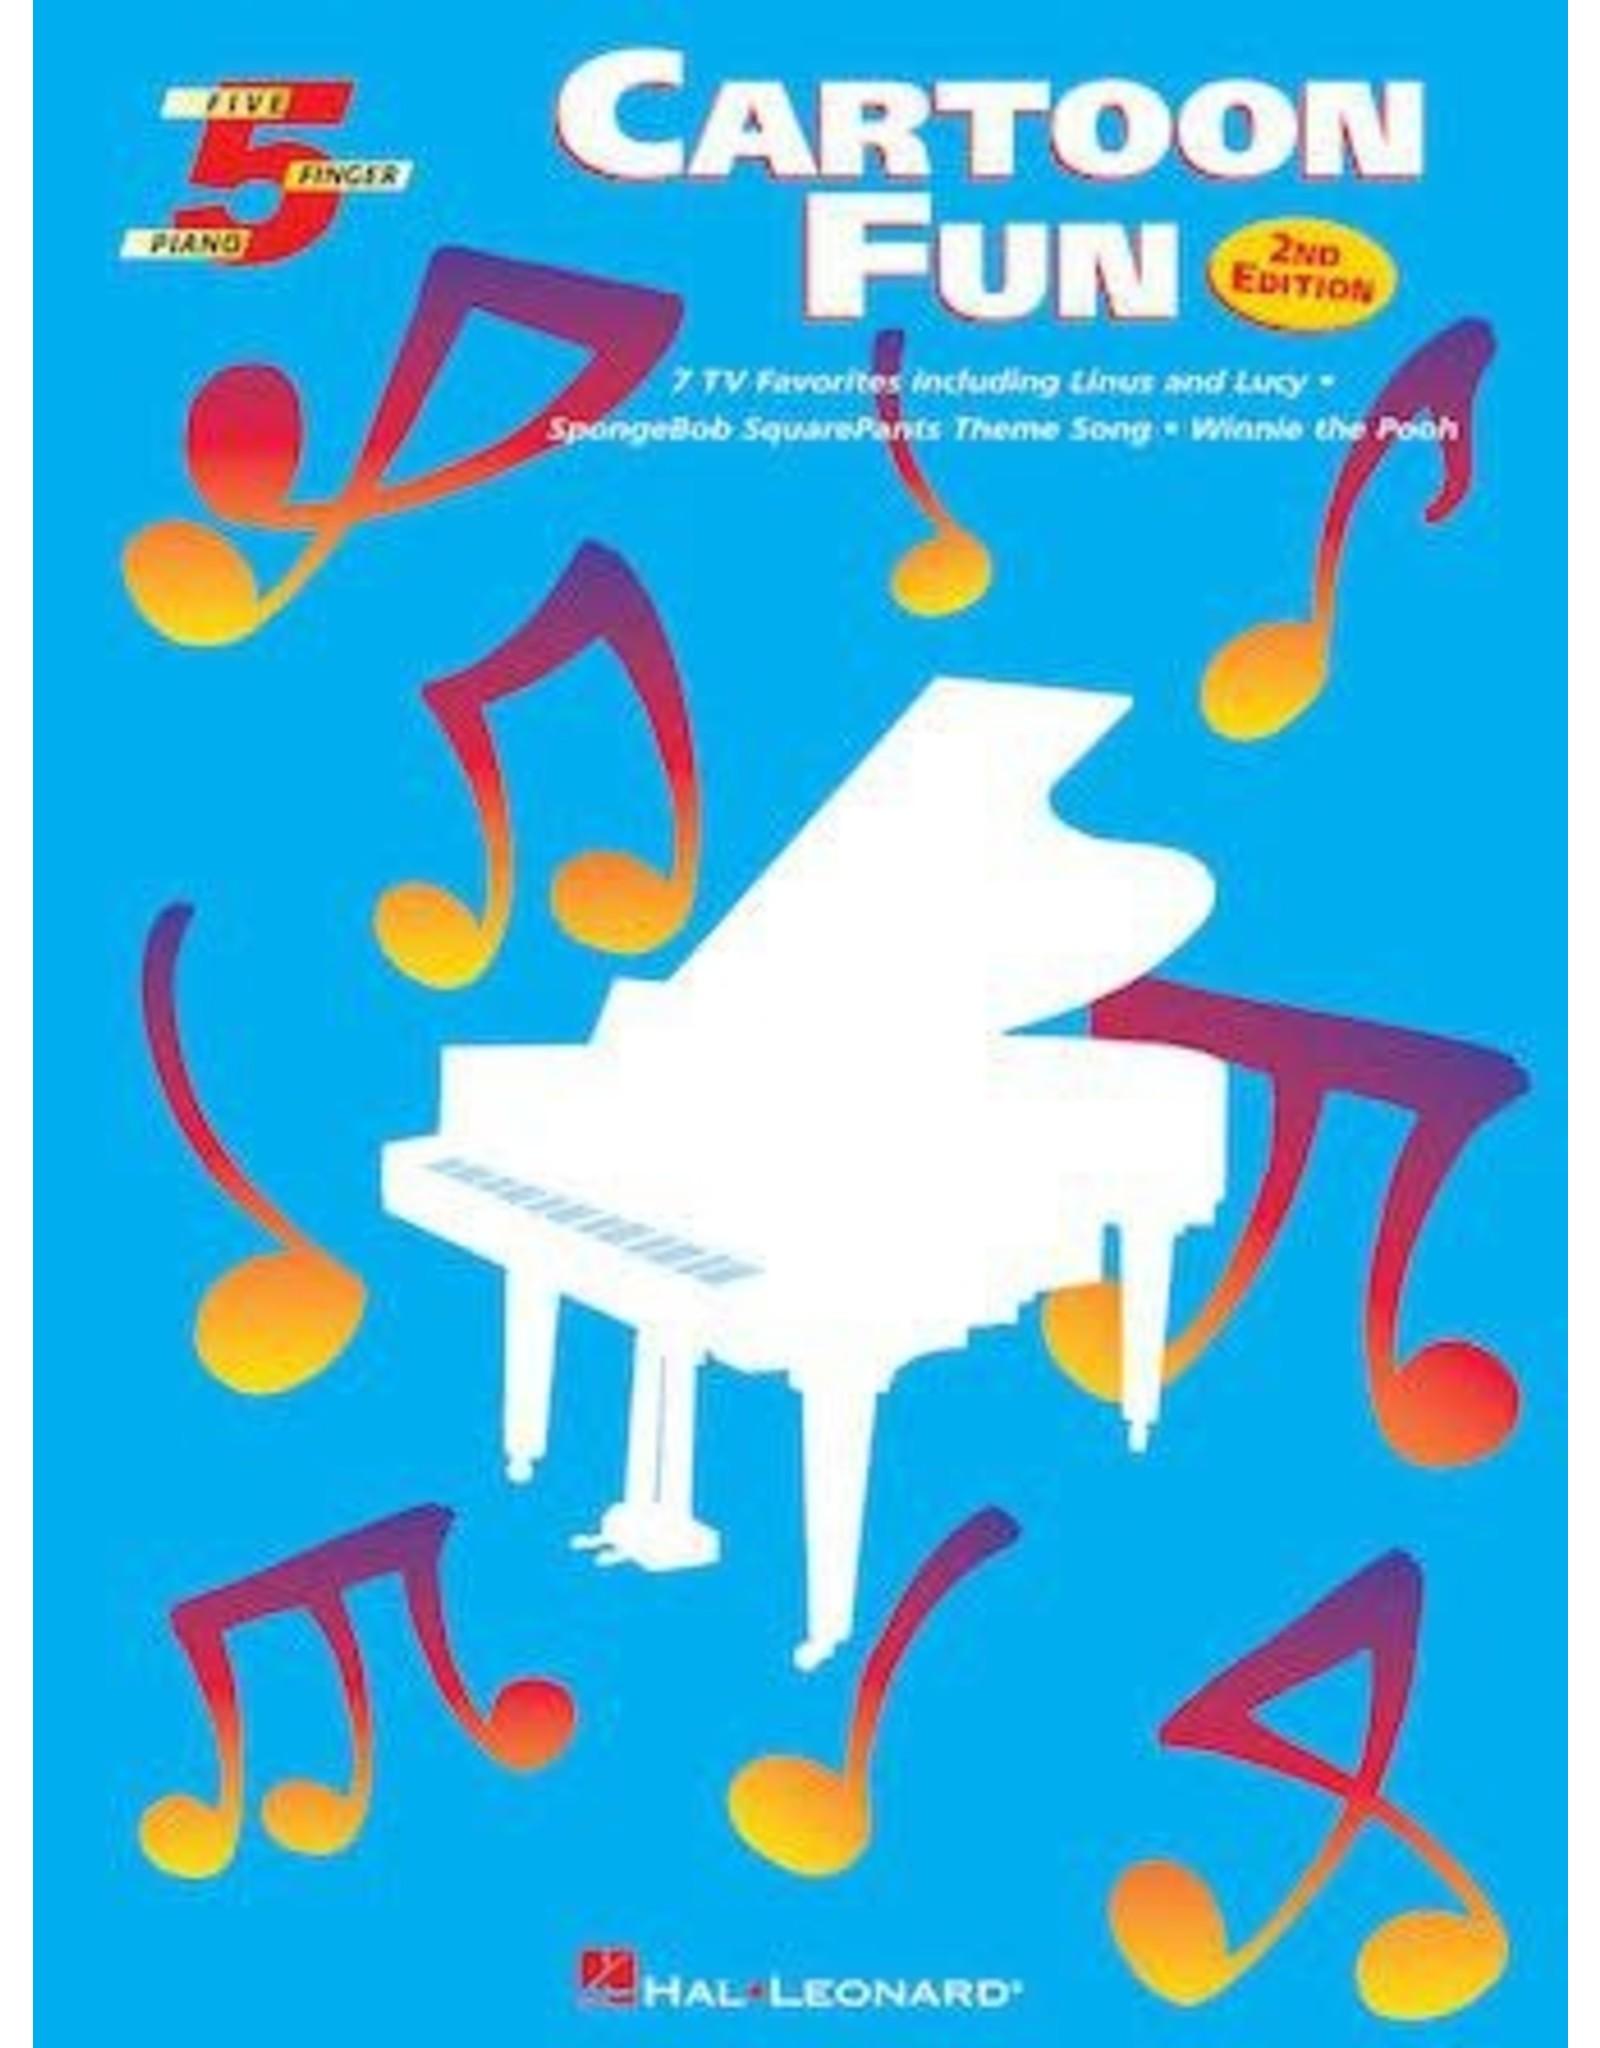 Hal Leonard Cartoon Fun 5 Finger